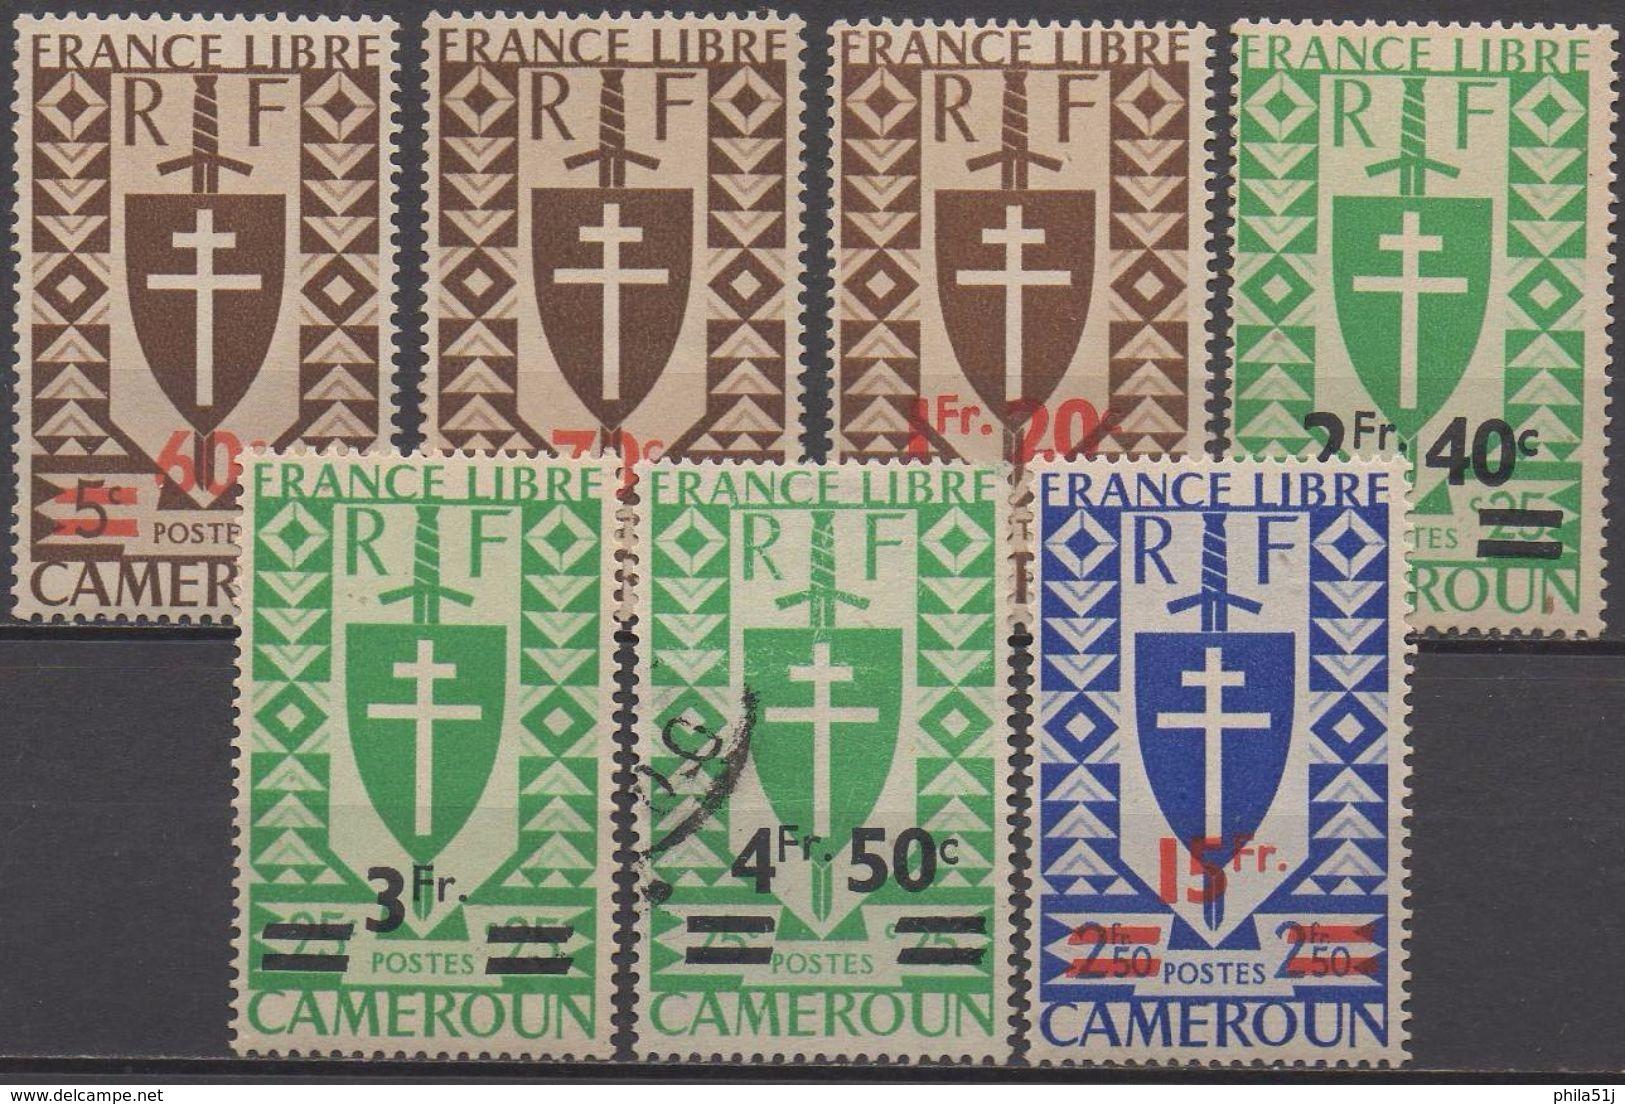 CAMEROUN   N°267/273 Sauf 272 NEUF** Plus  272  OBL VOIR  SCAN - Cameroun (1915-1959)